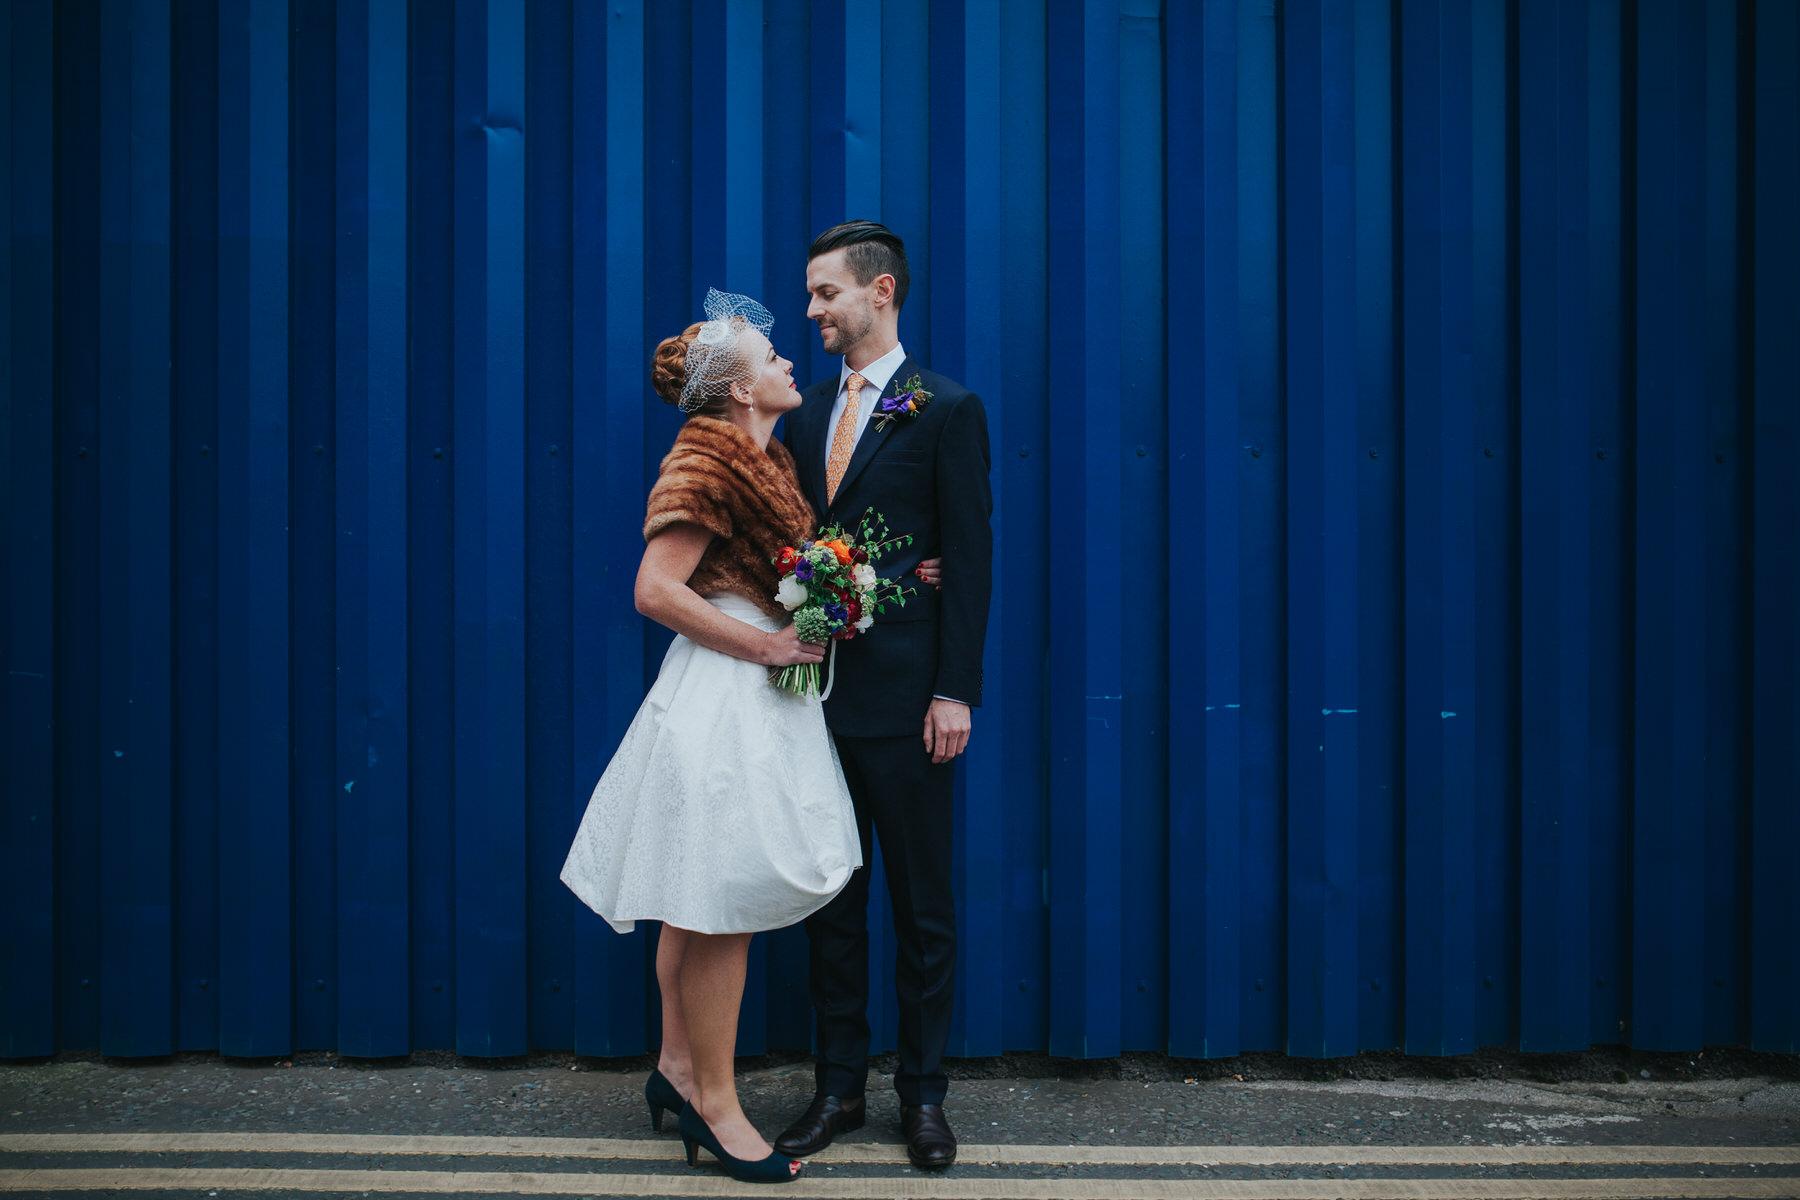 bright-blue-metal-background-urban-wedding-portrait-bride-groom-under-railway-bridge.jpg